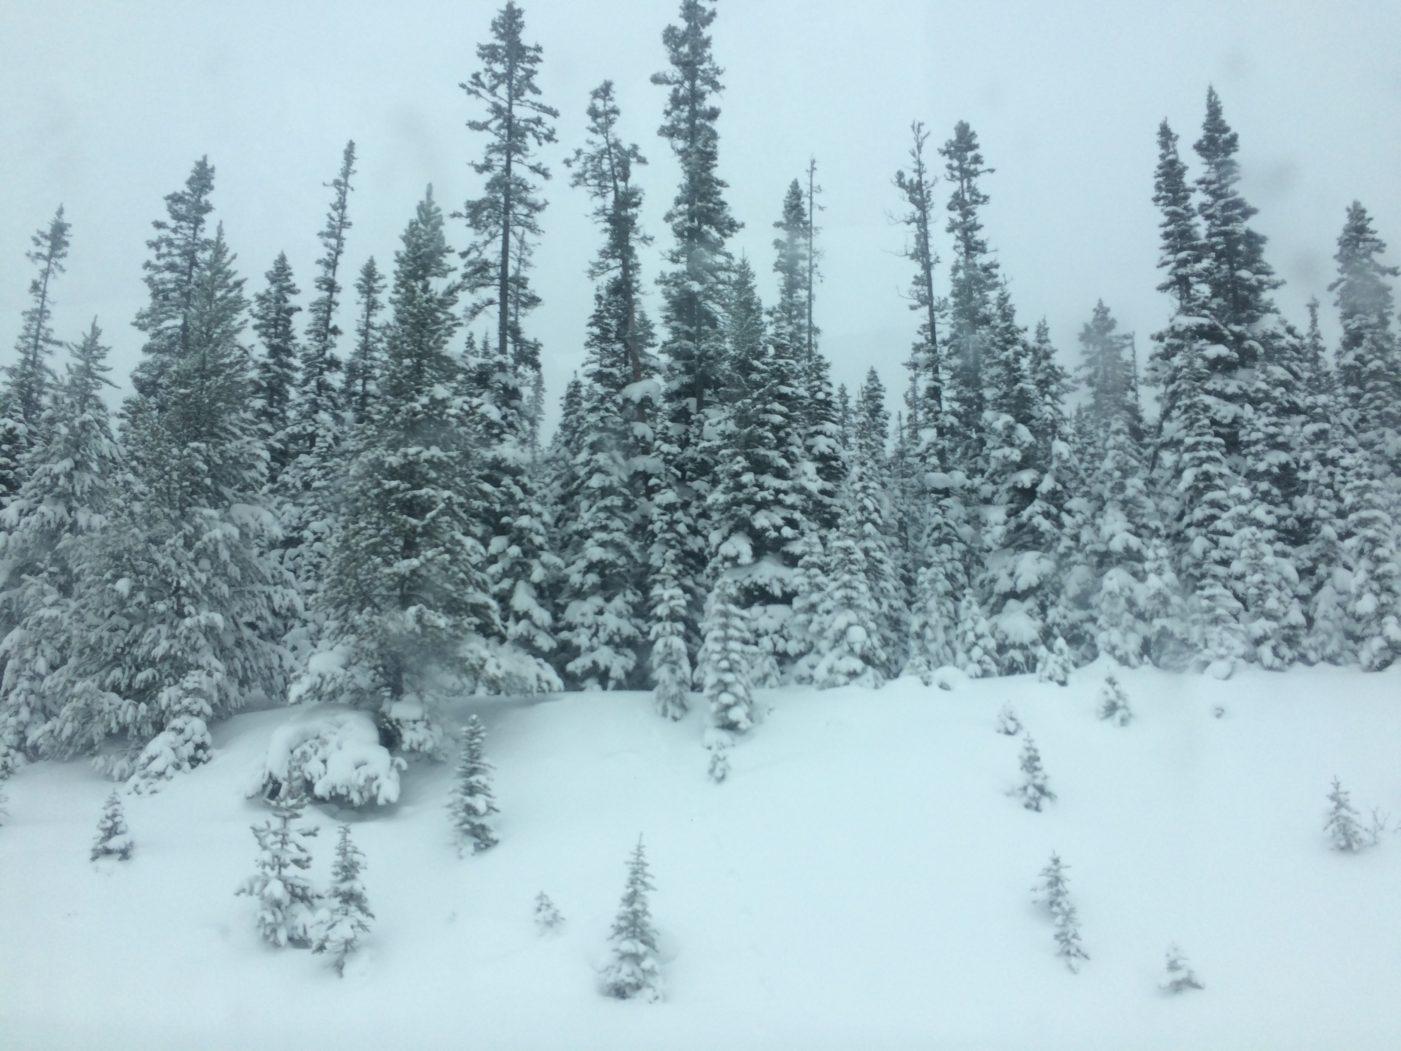 Trees in Alberta